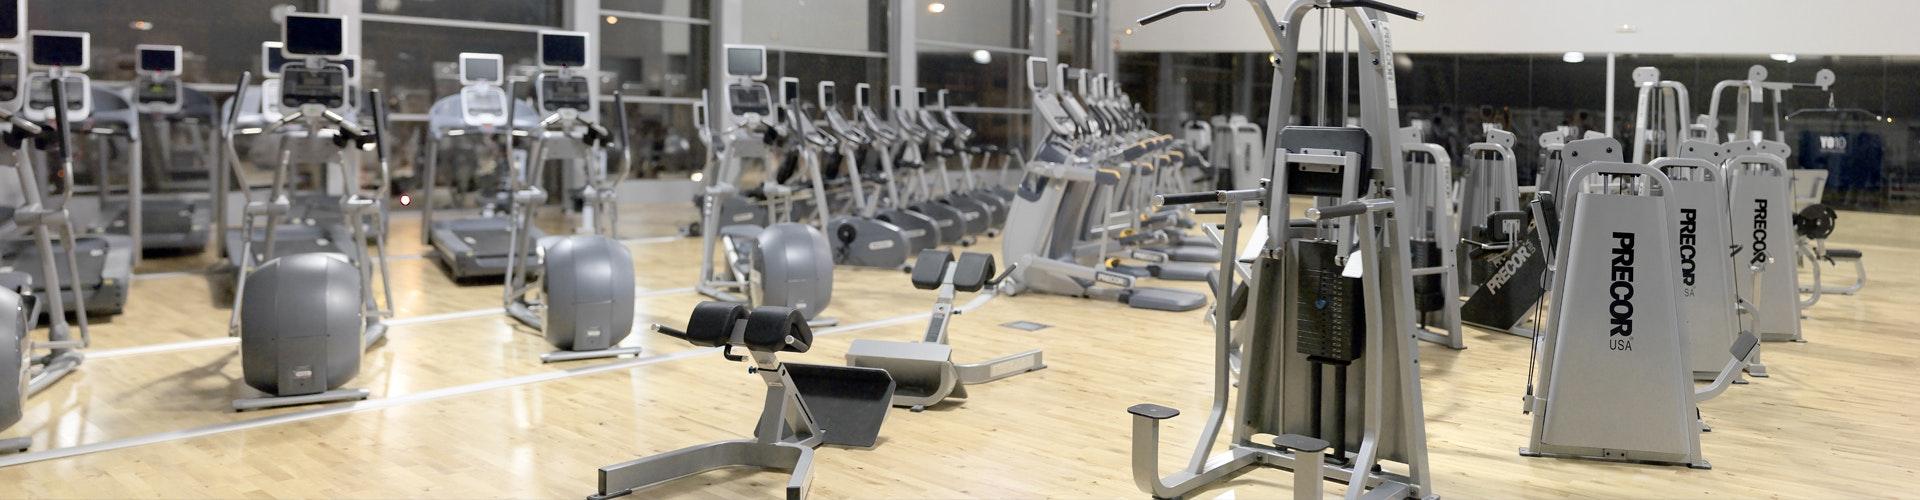 Foto 4 Oferta Yo10 Sport & Spa Club Granada {2} - GymForLess